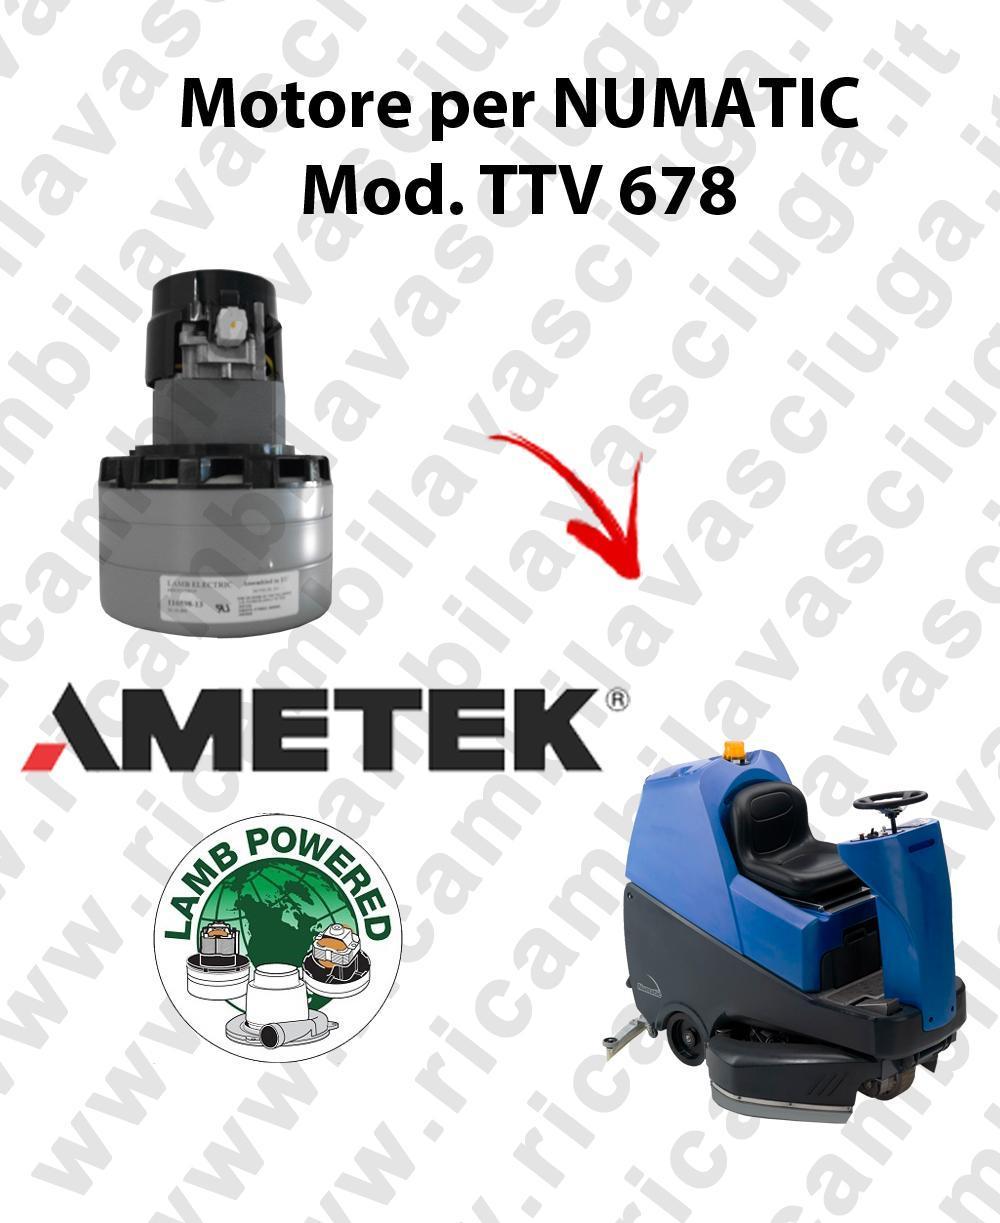 TTV 678 Ametek Vacuum Motor scrubber dryer NUMATIC